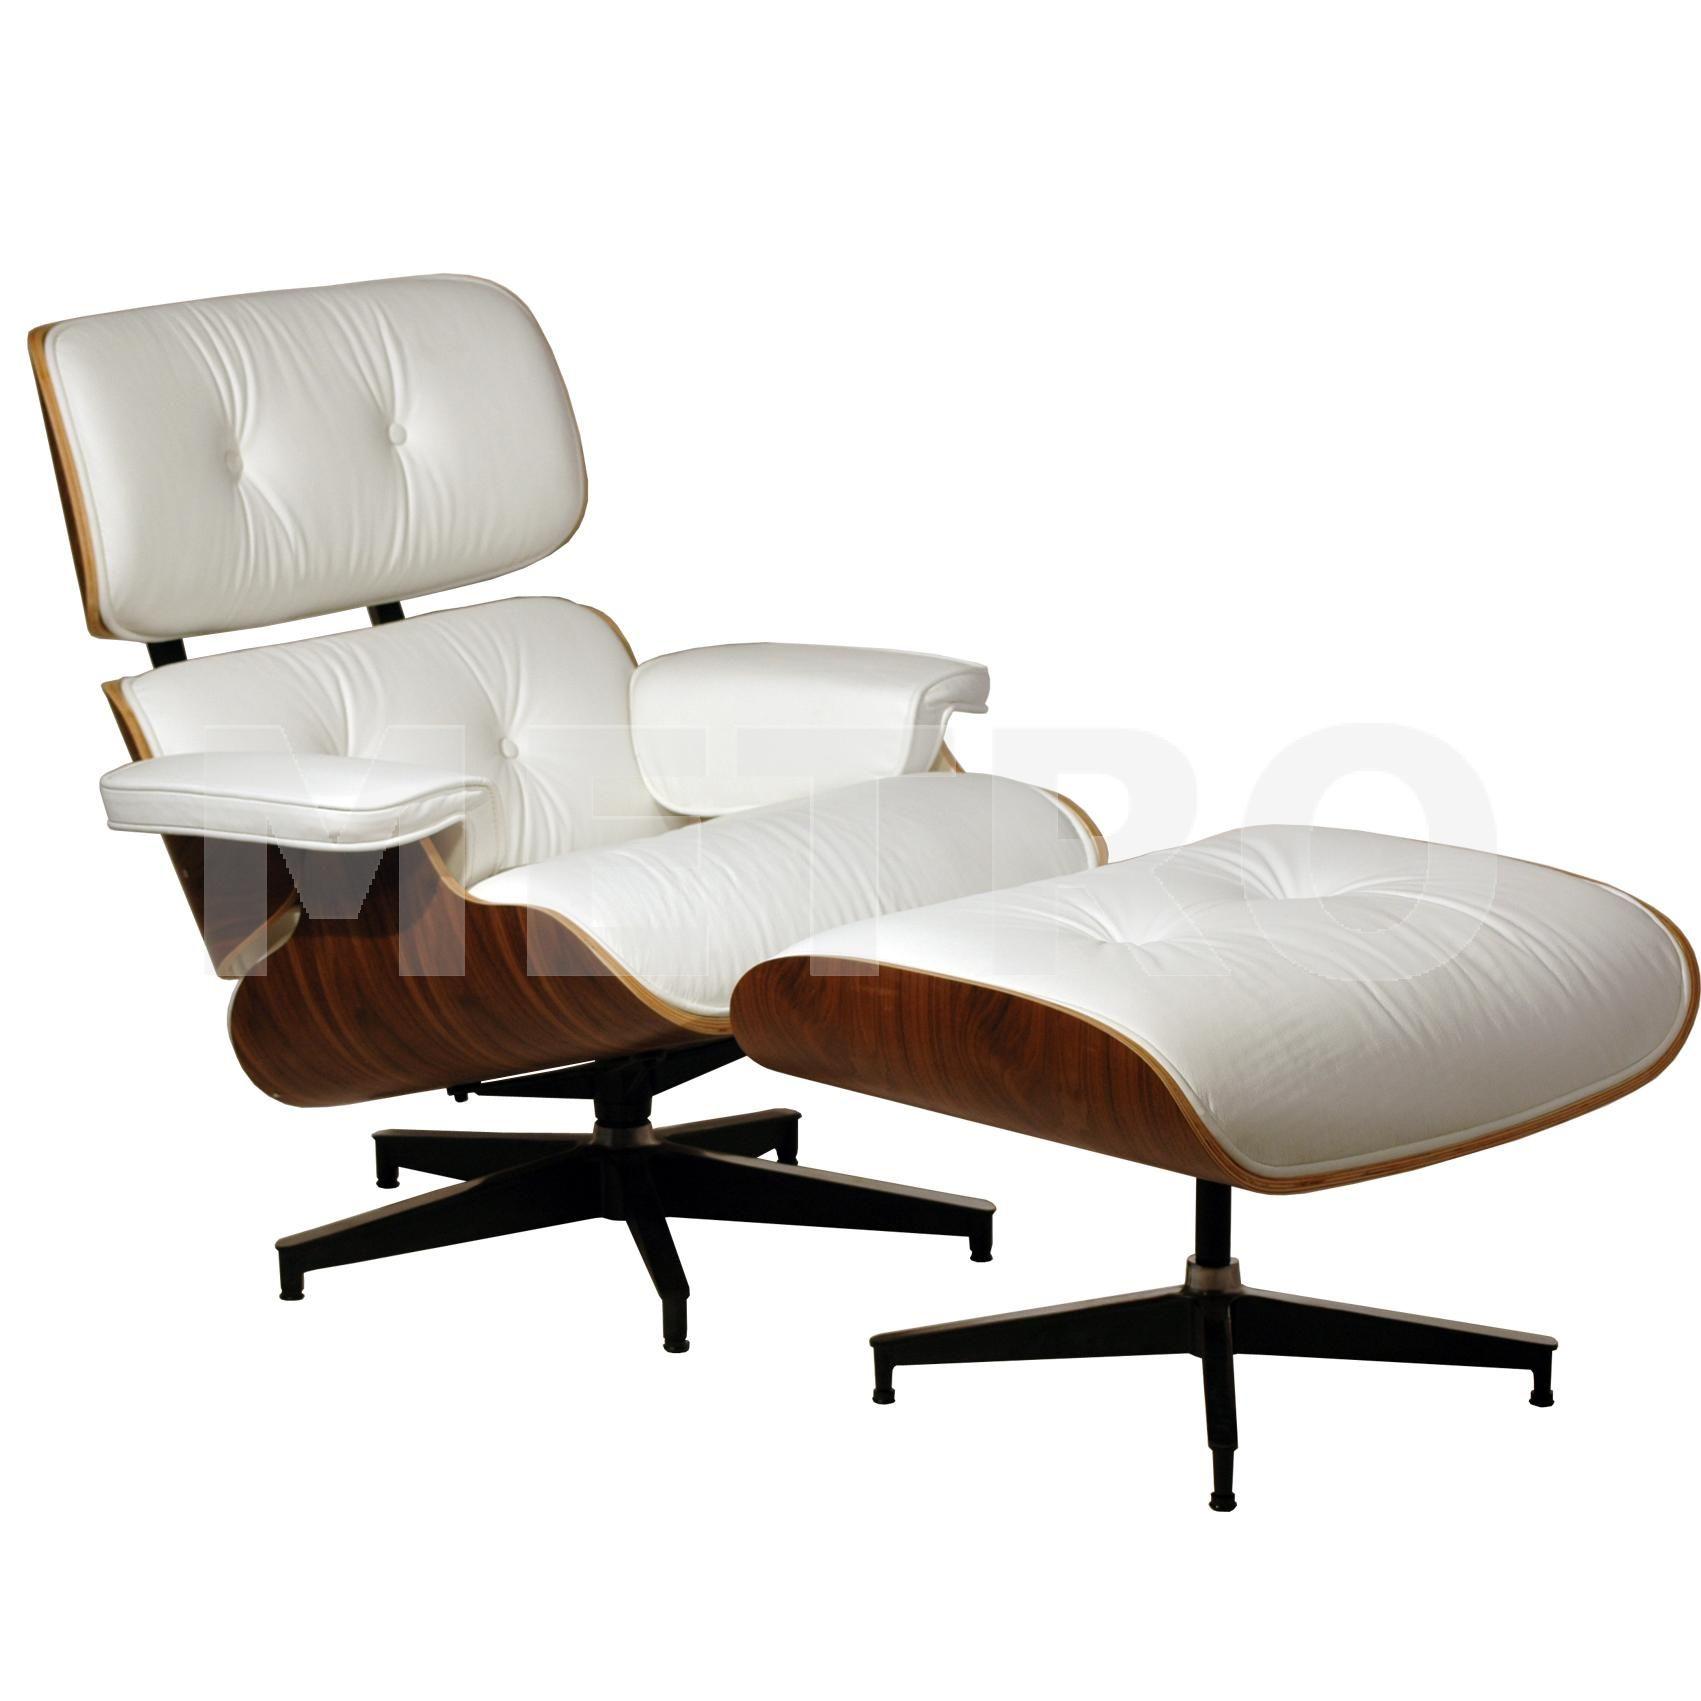 Fabulous Eames Lounge Chair Ottoman In White Leather White Eames Uwap Interior Chair Design Uwaporg